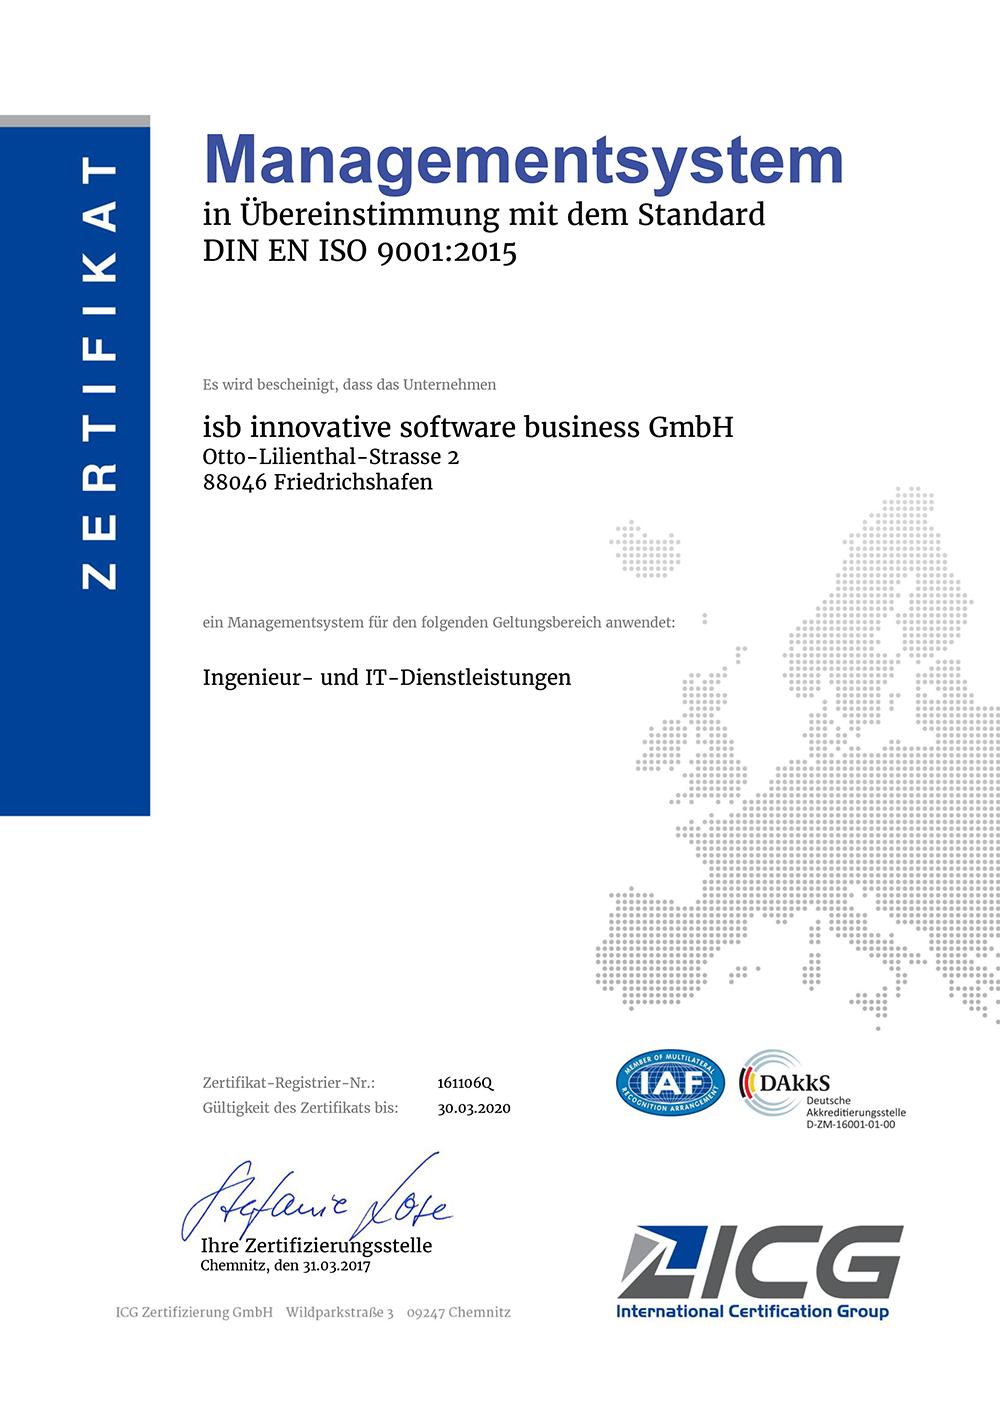 iso Zertifikat isb GmbH